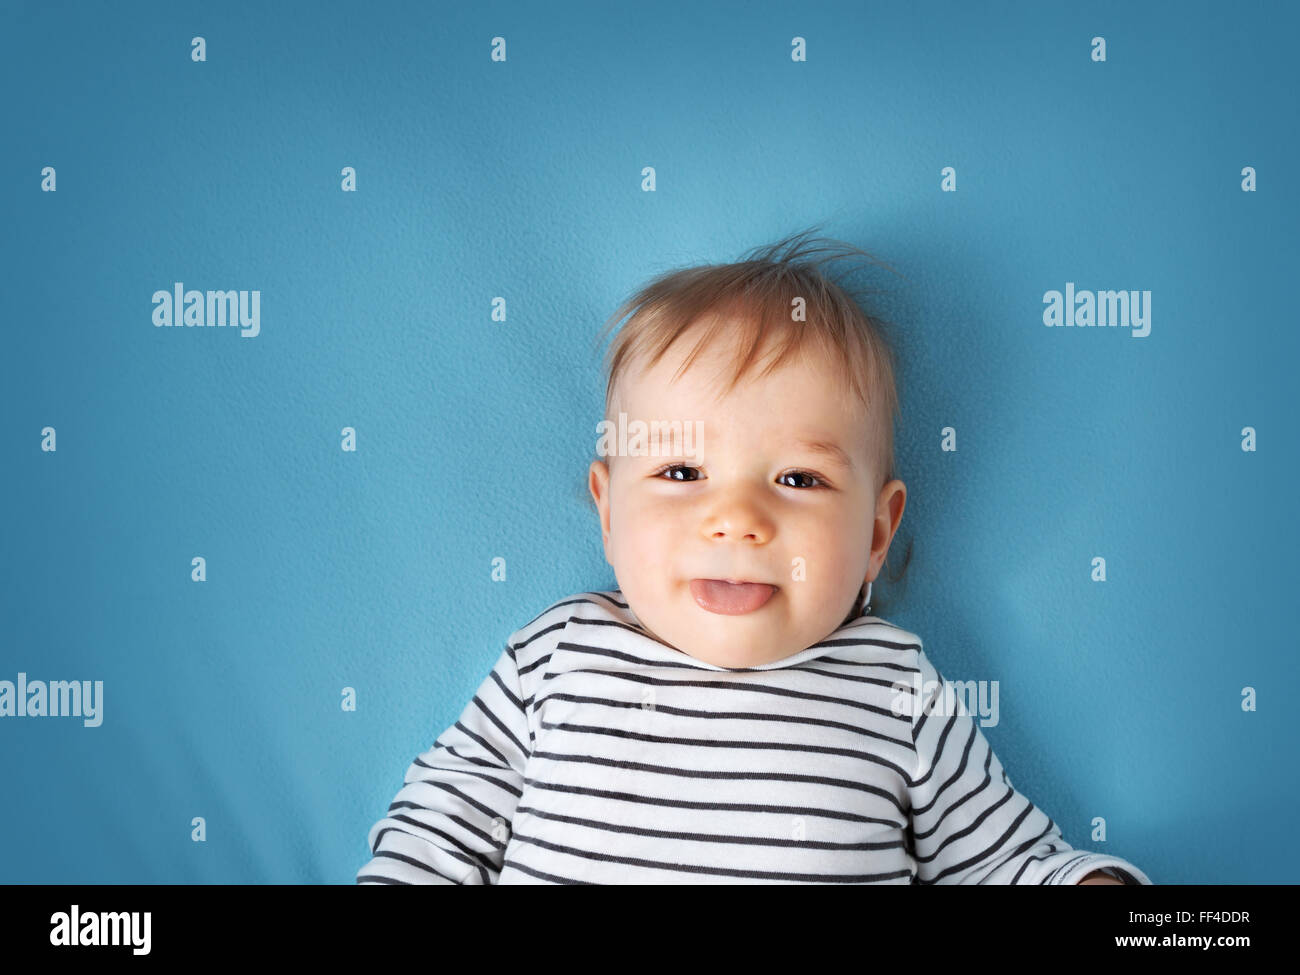 little boy on blue blanket background Stock Photo